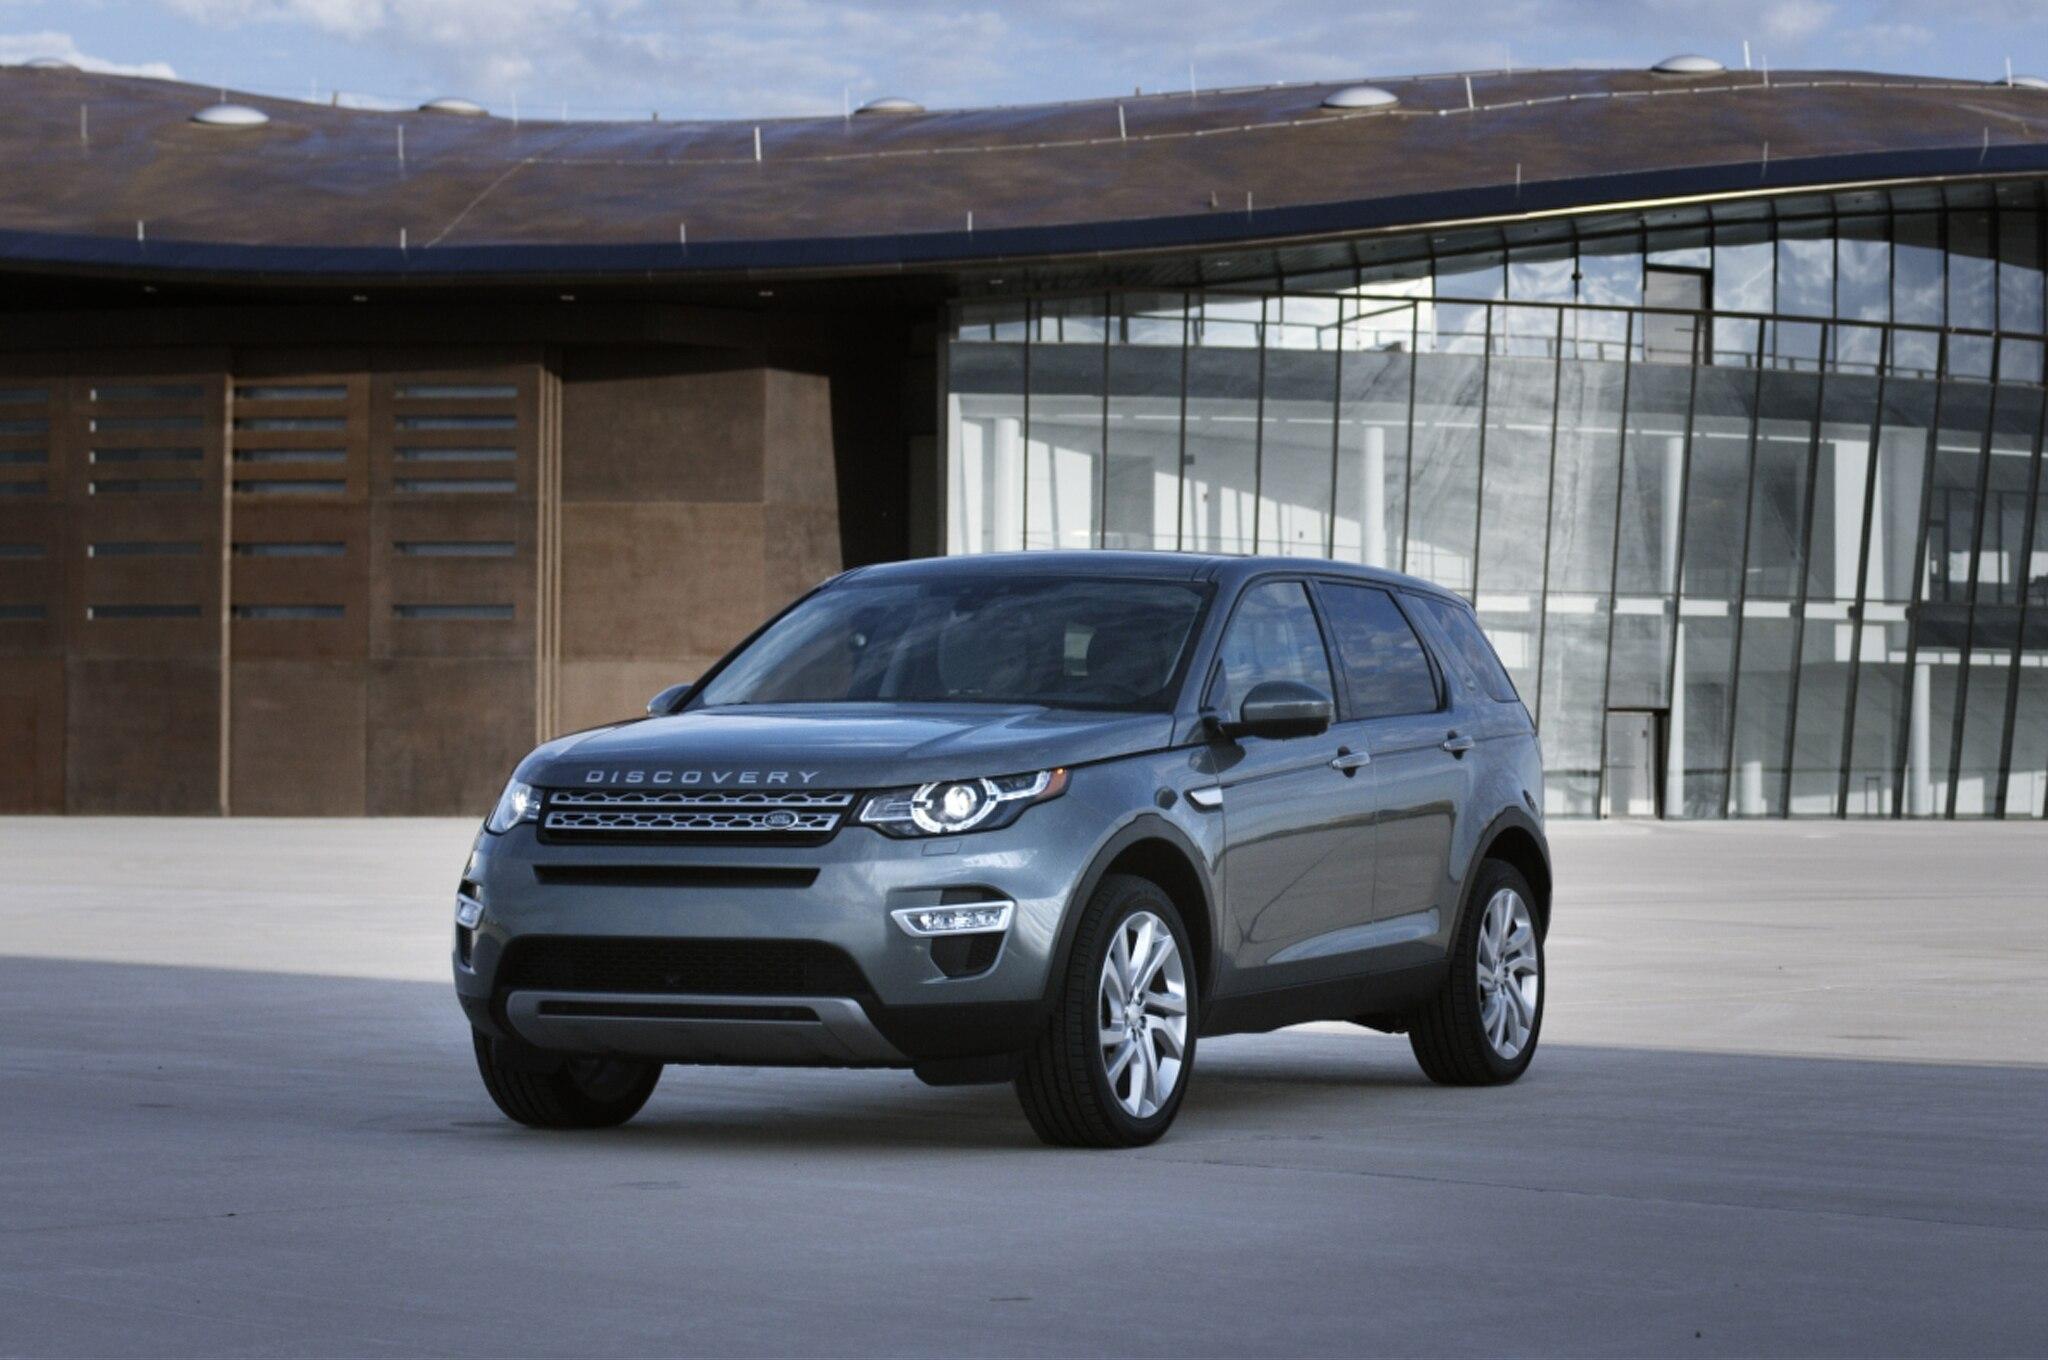 http://st.automobilemag.com/uploads/sites/11/2015/01/2015-Land-Rover-Discovery-Sport-film-still-front-three-quarter.jpg